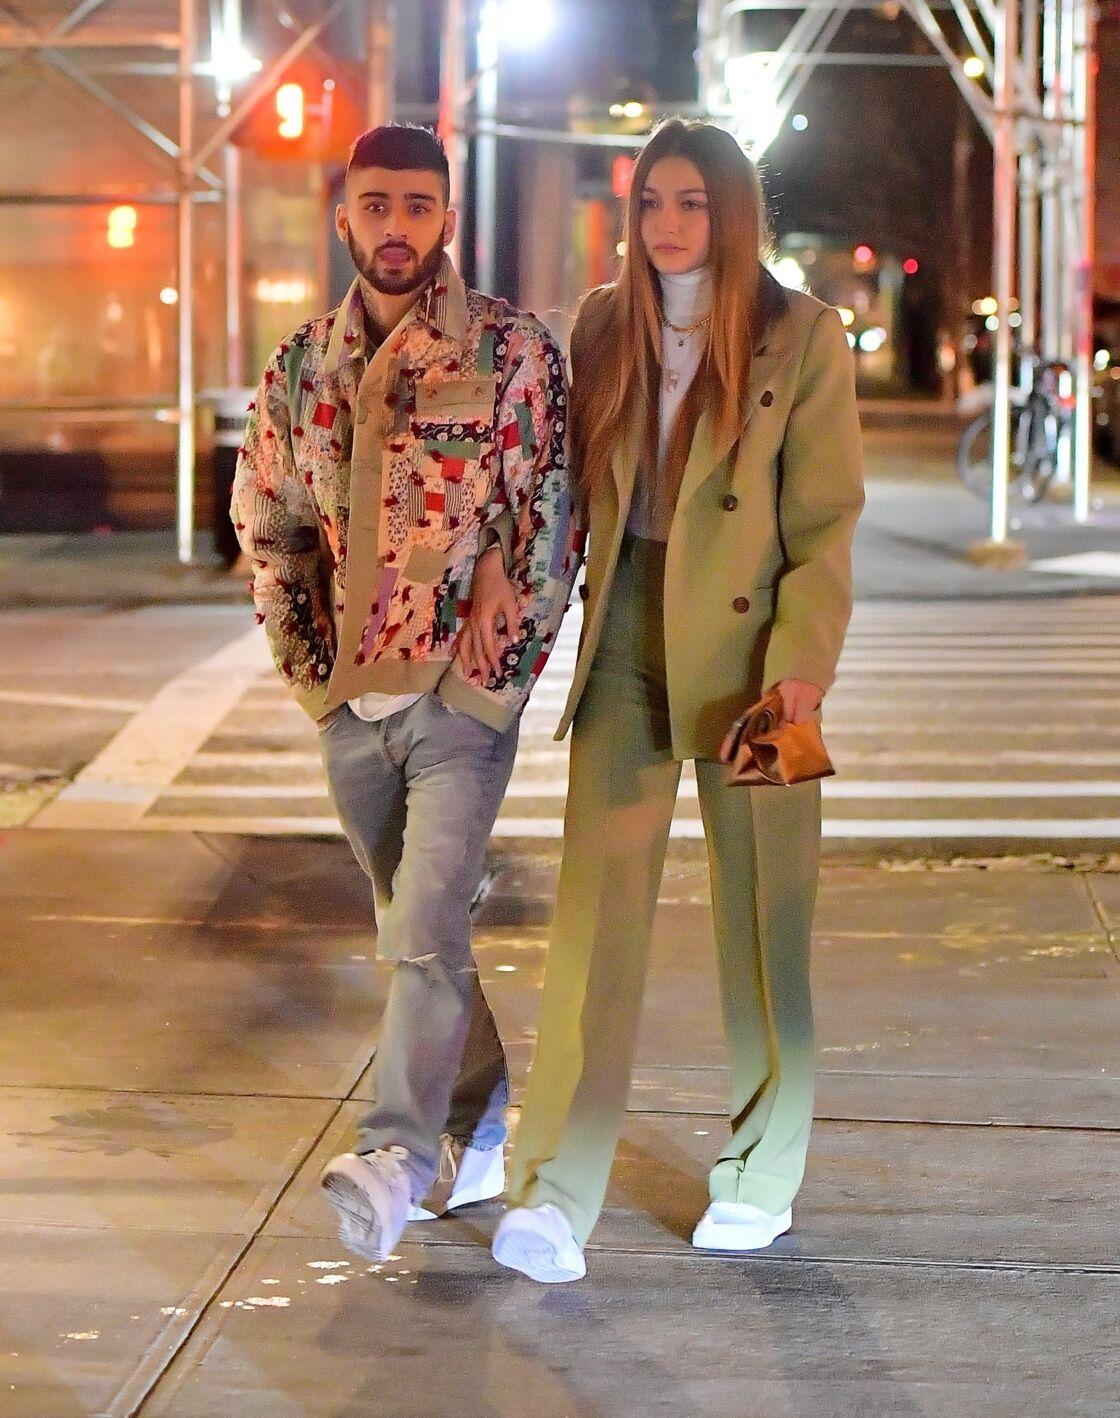 Gigi Hadid et Zayn Malik à New York, le 11 janvier 2020.